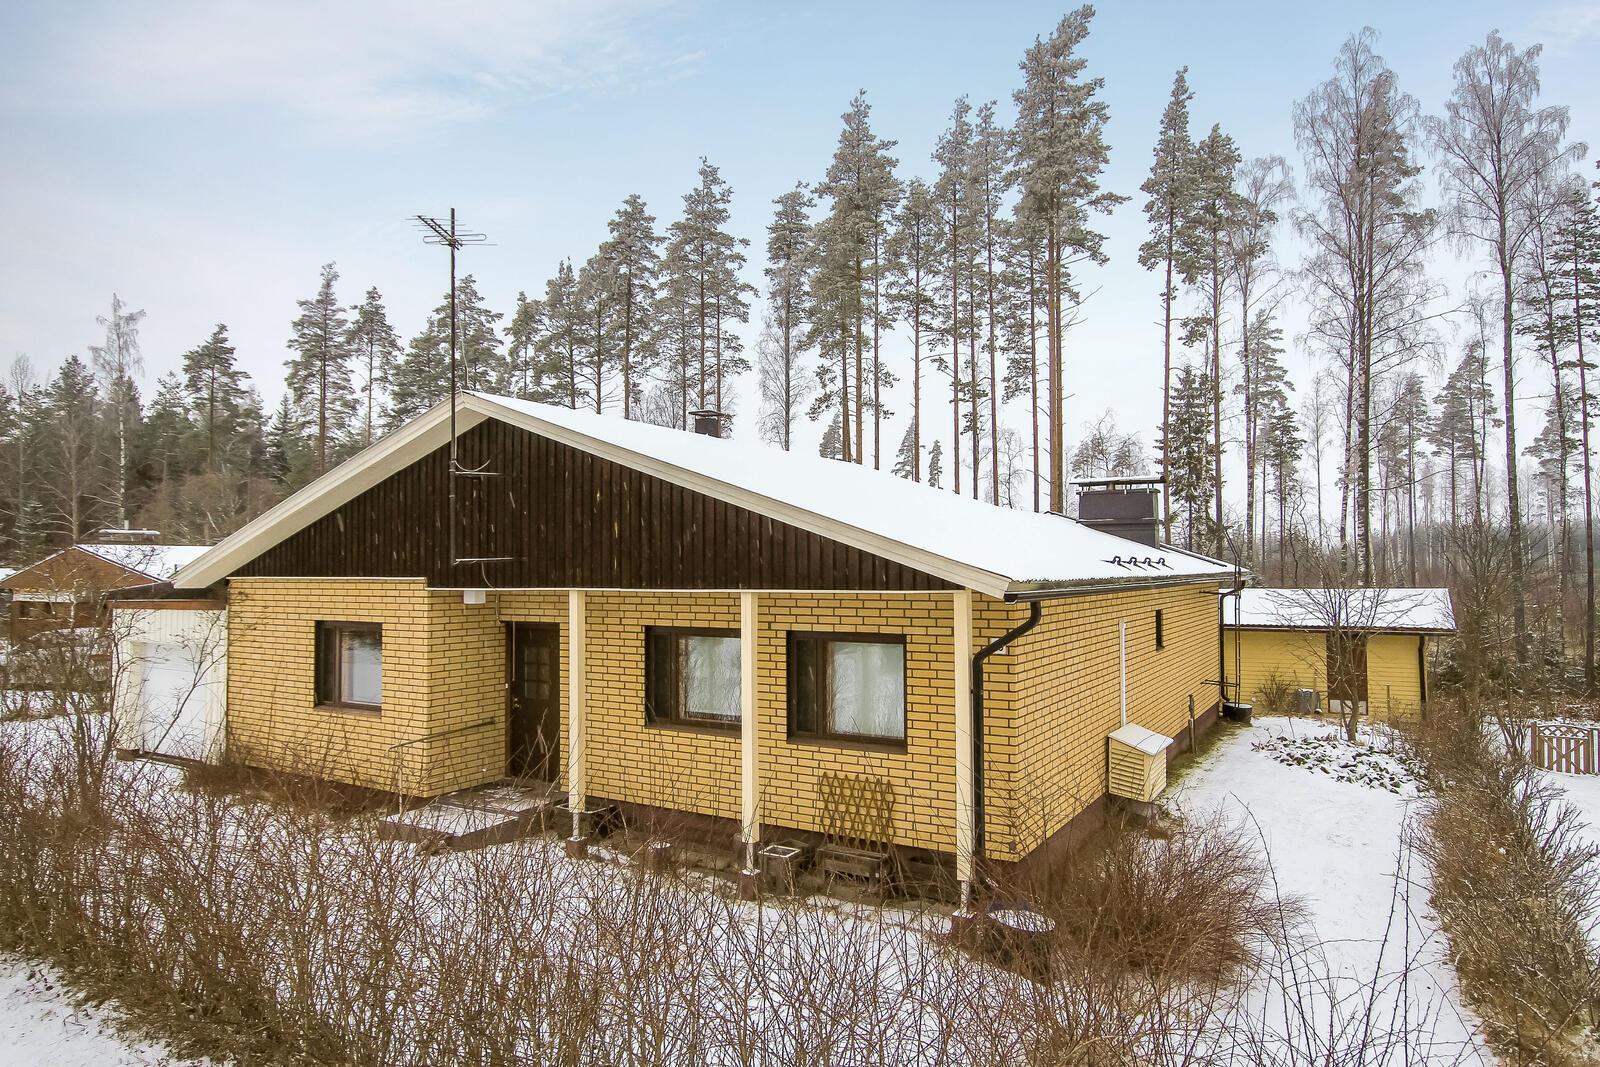 Joutseno / Pulp, Lappeenranta